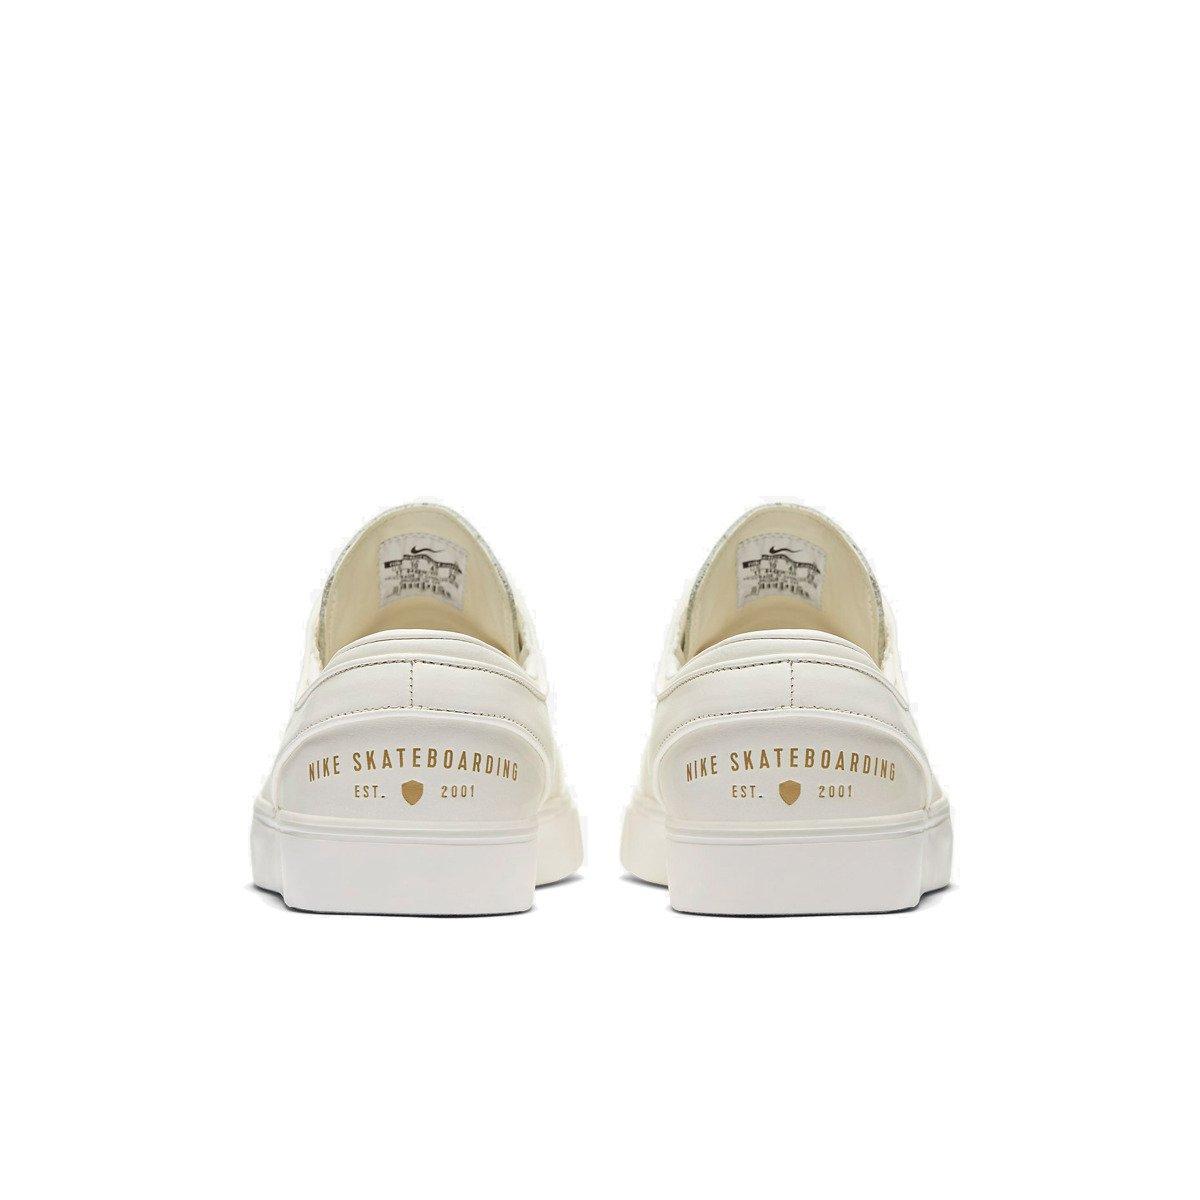 9cad1fee1c15 ... Nike SB Air Zoom Stefan Janoski Hazelnut black baroque Brown Shoes